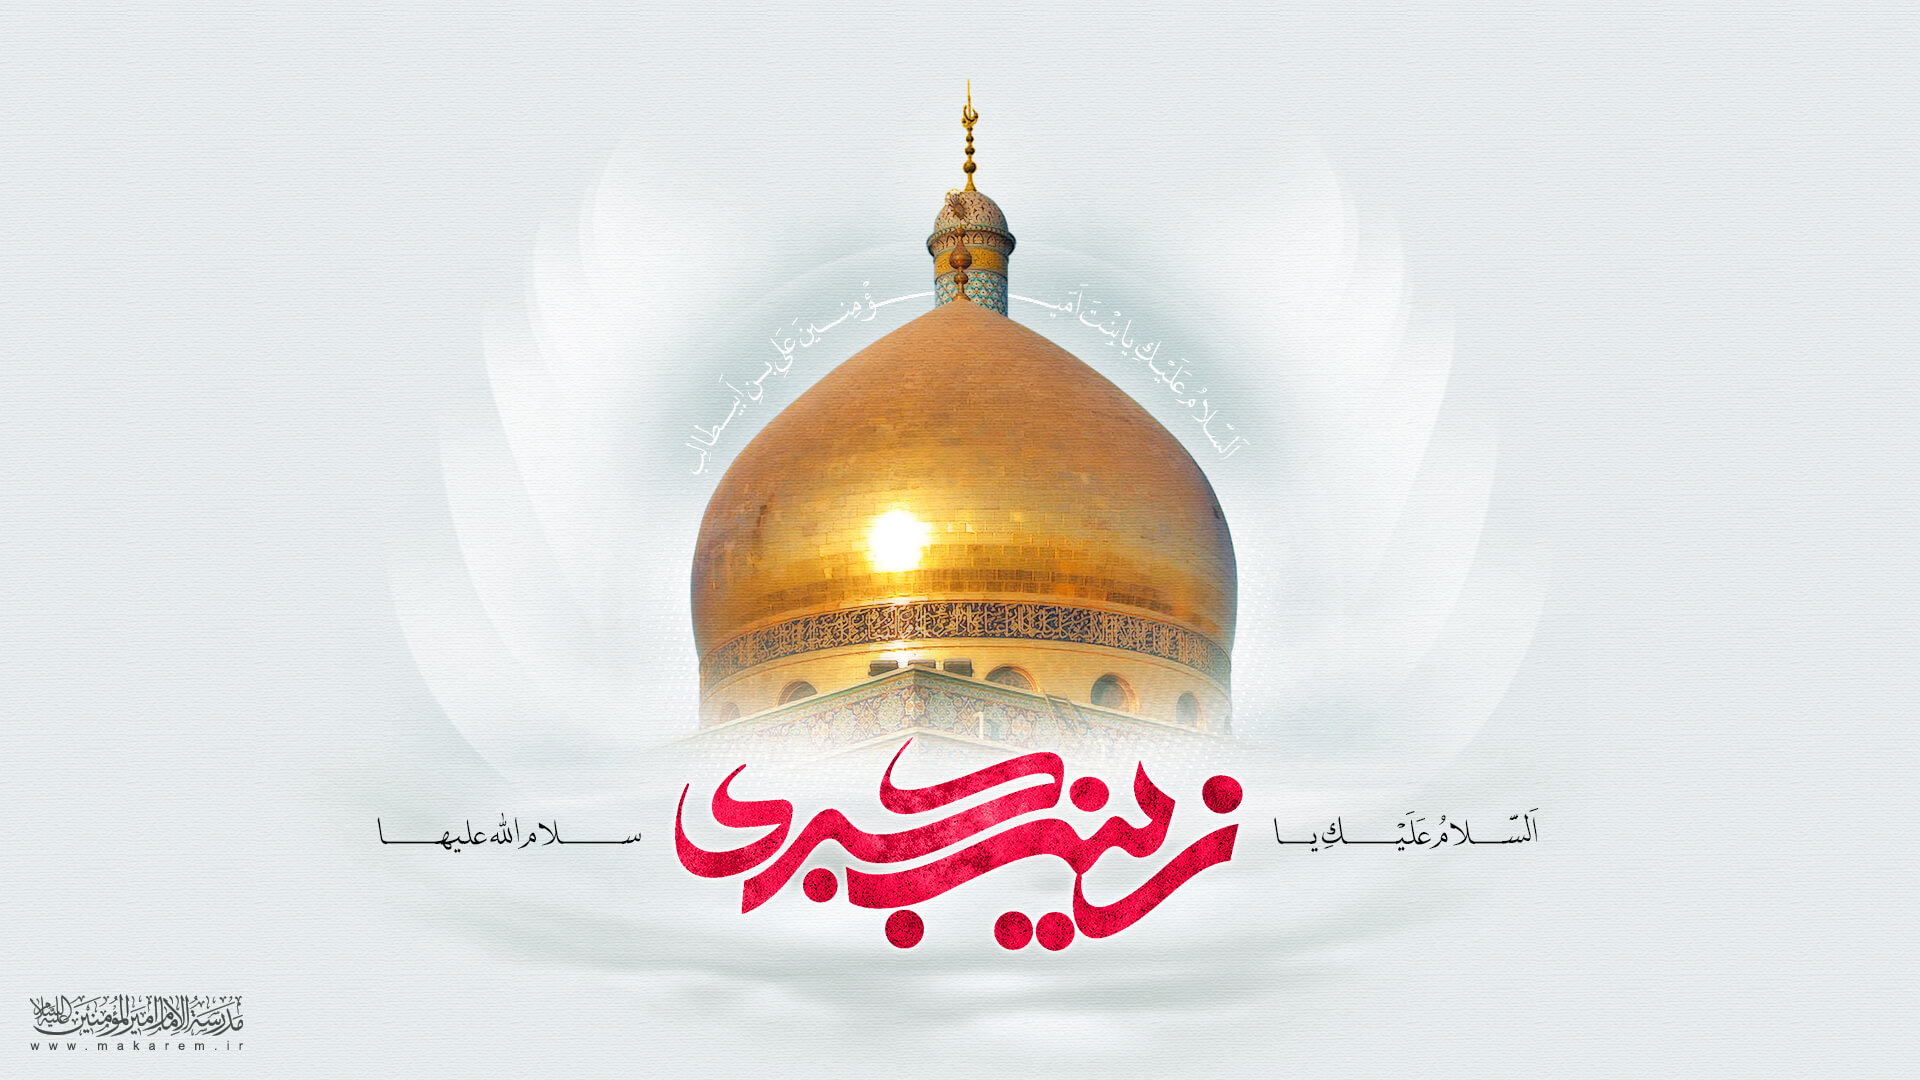 حضرت زینب 03-مدرسه الامام امیر المومنین (ع)